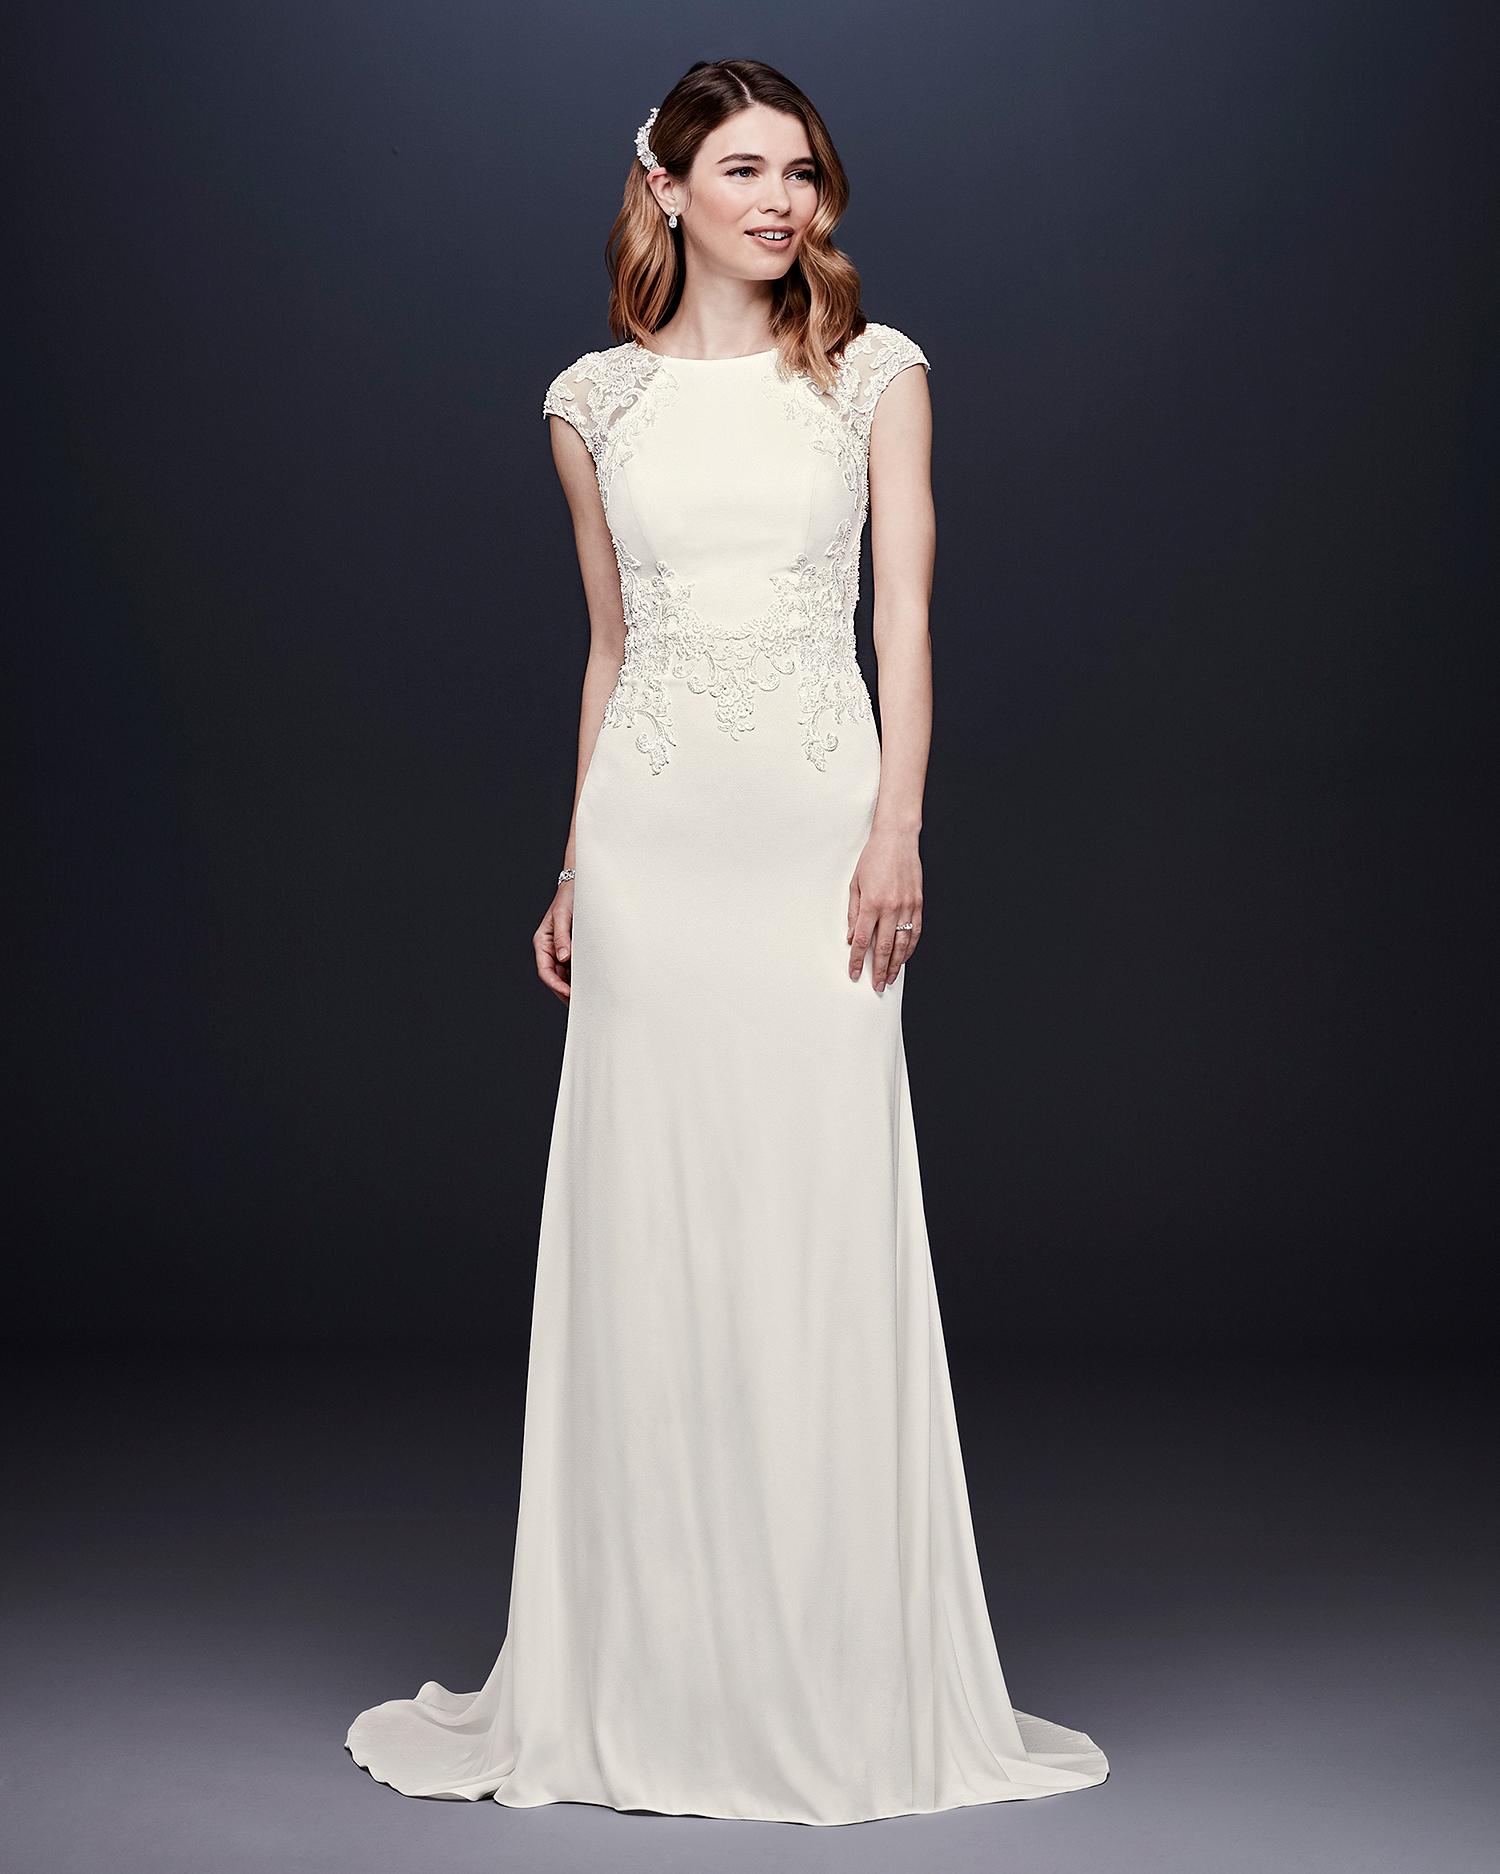 davids bridal wedding dress fall 2019 embroidered cap-sleeved sheath